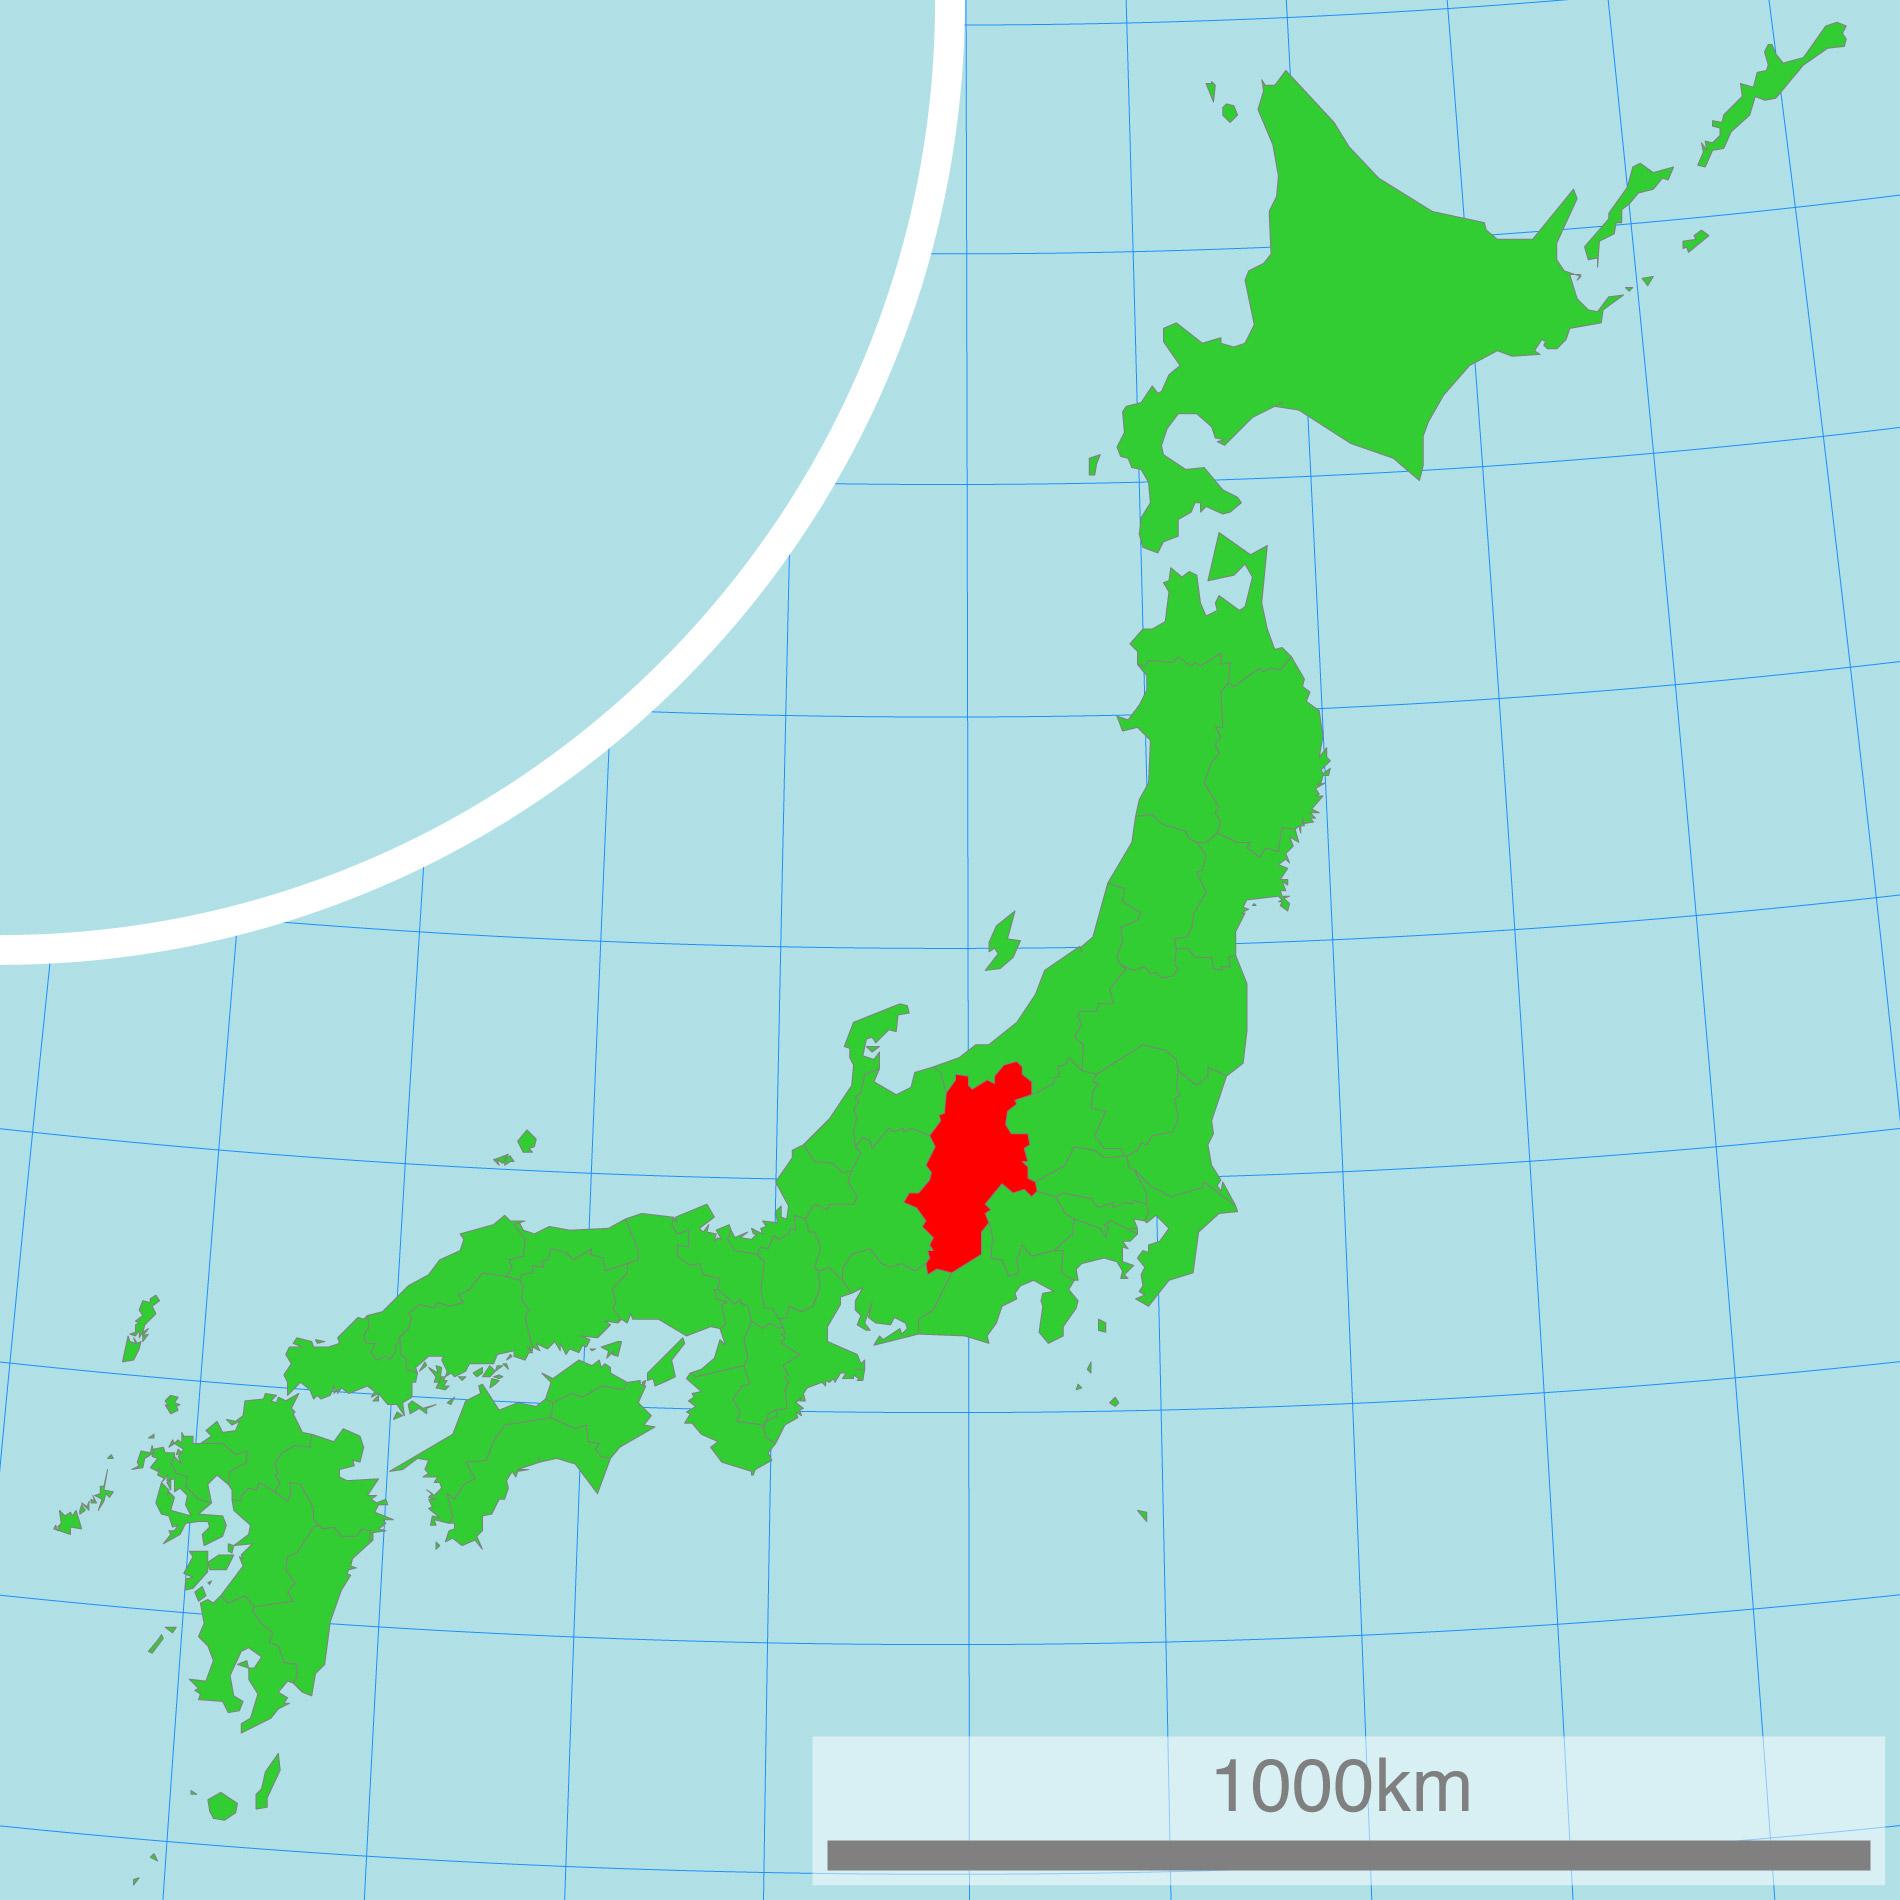 Japankarte: Die Präfektur Nagano.